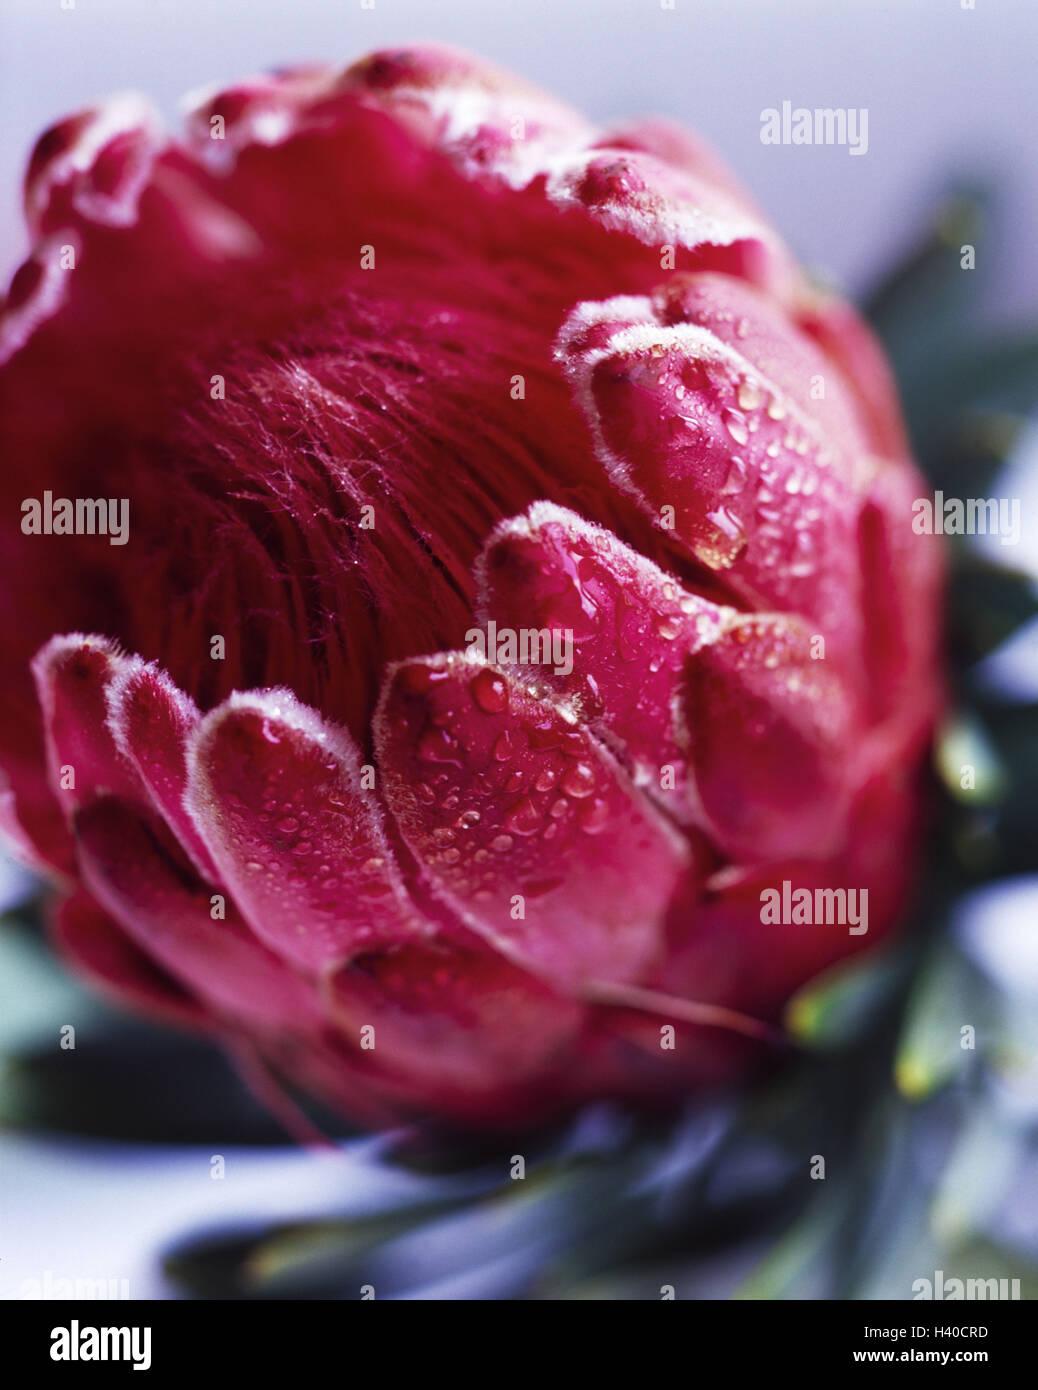 Protea Protea Spec Detail Blossom Red Drops Water Plant Stock